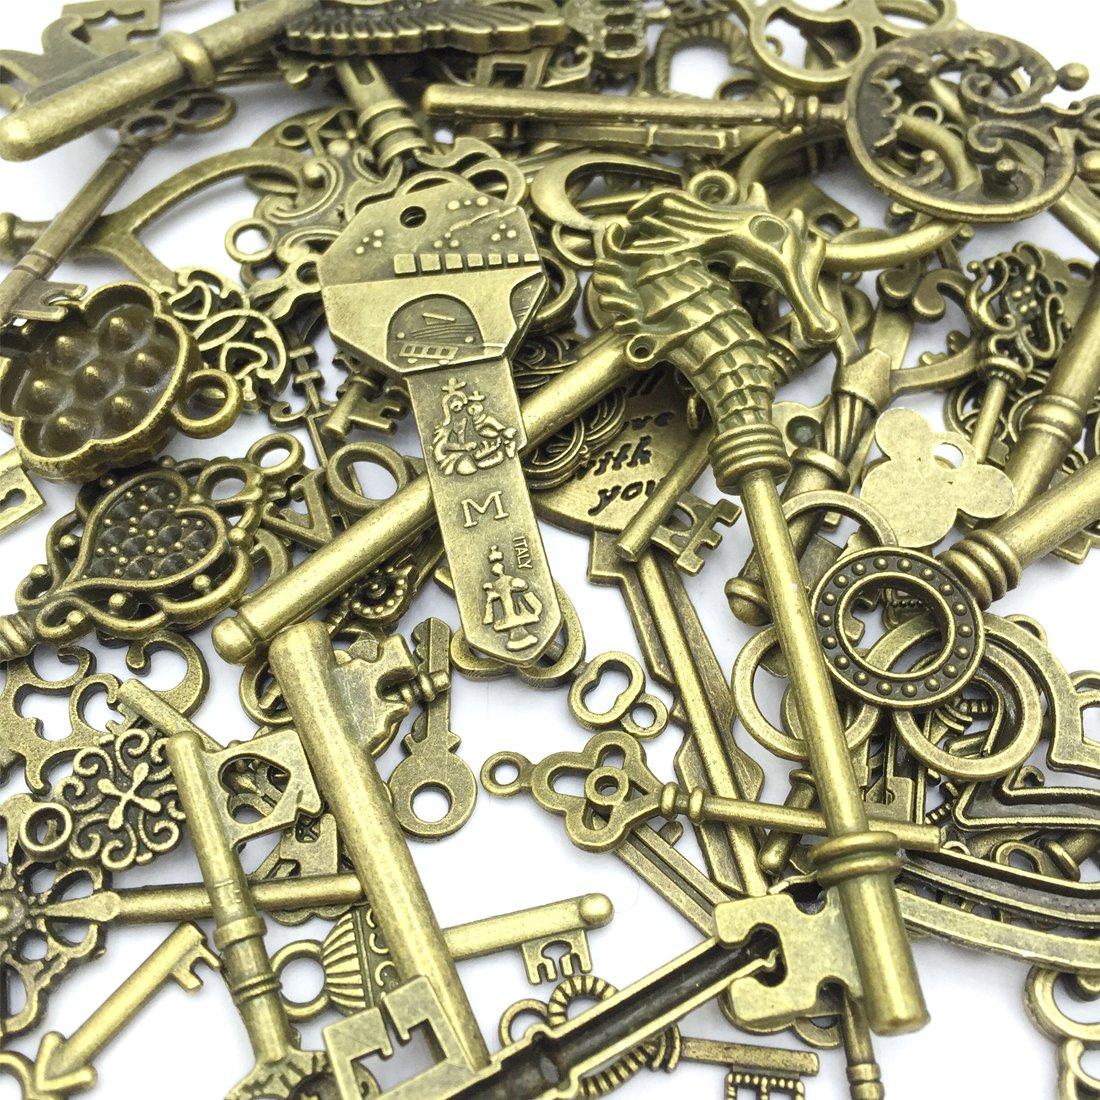 10.5oz//300g Wholesale Bulk Lots Mixed Set of 100 Antique Bronze Brass Skeleton Castle Dungeon Pirate Keys JIALEEY Vintage Skeleton Keys